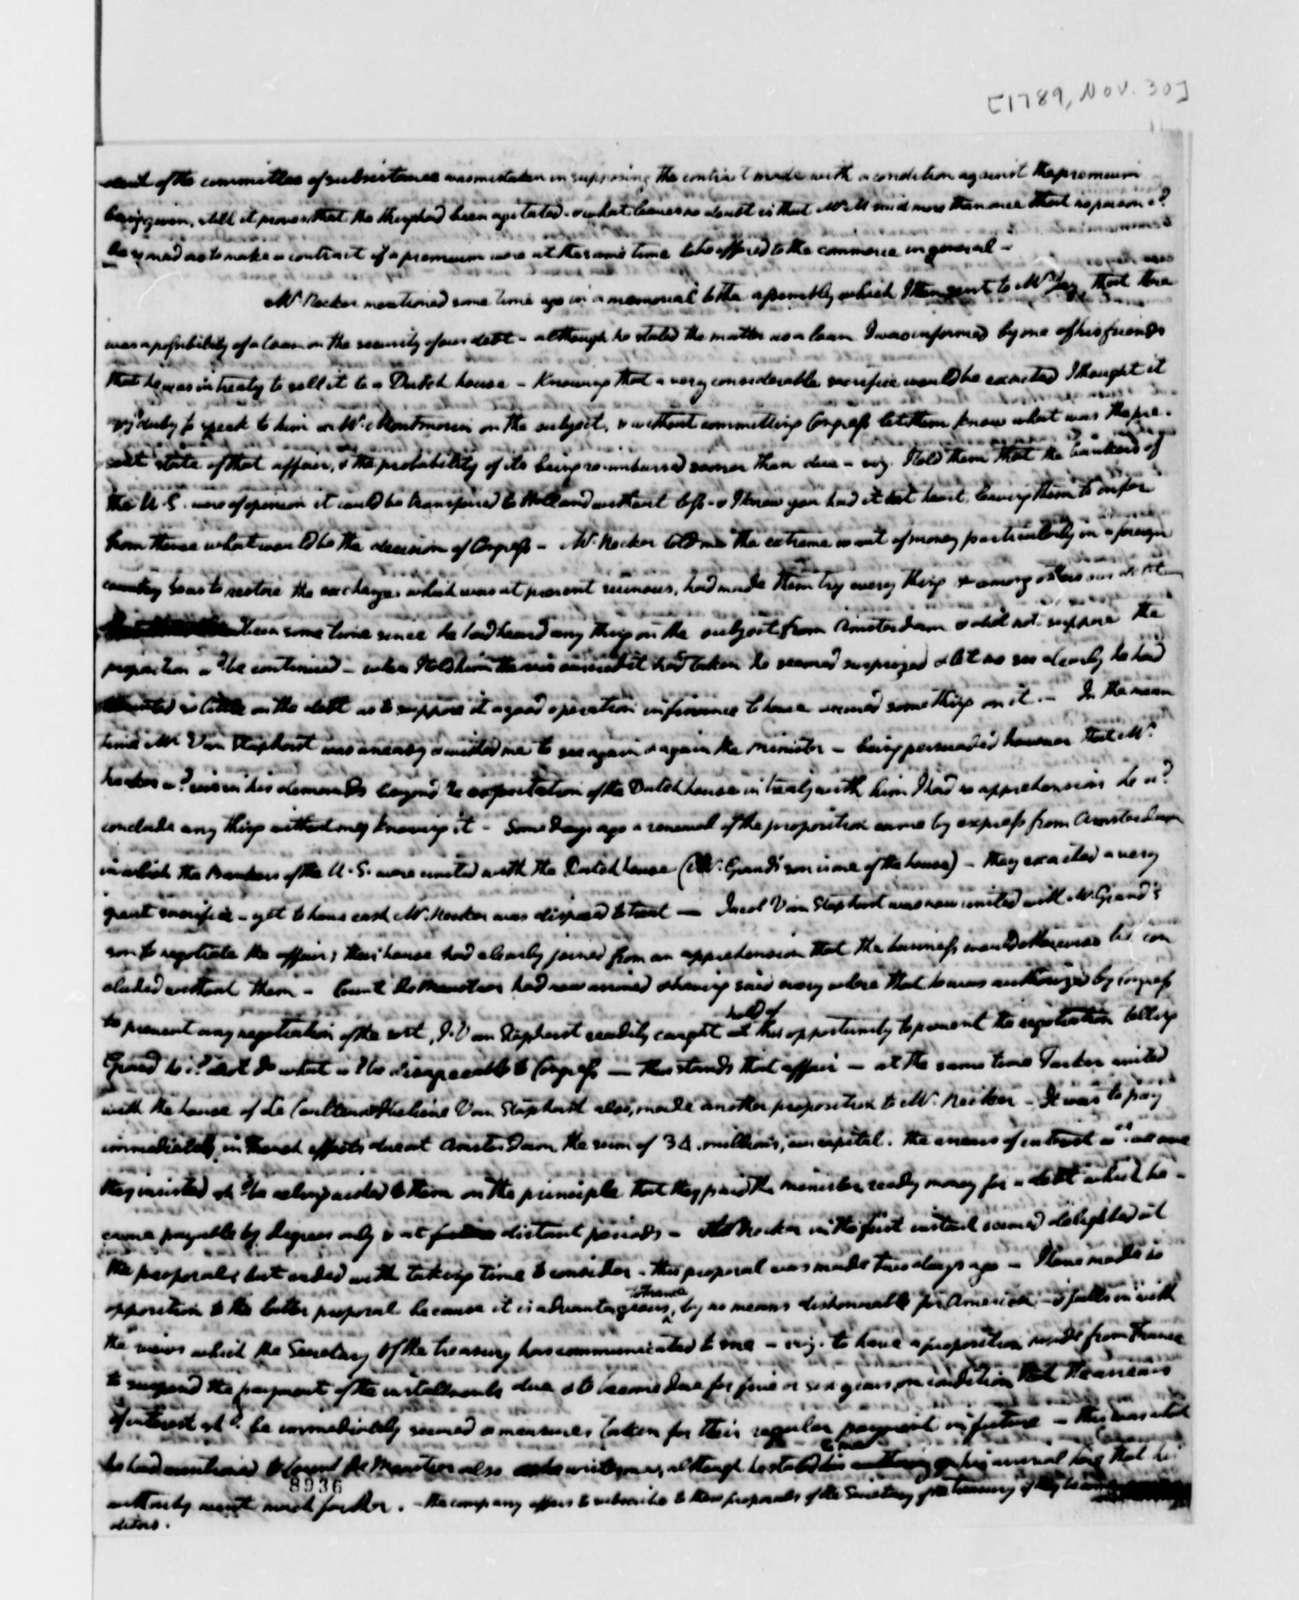 William Short to Thomas Jefferson, November 30, 1789